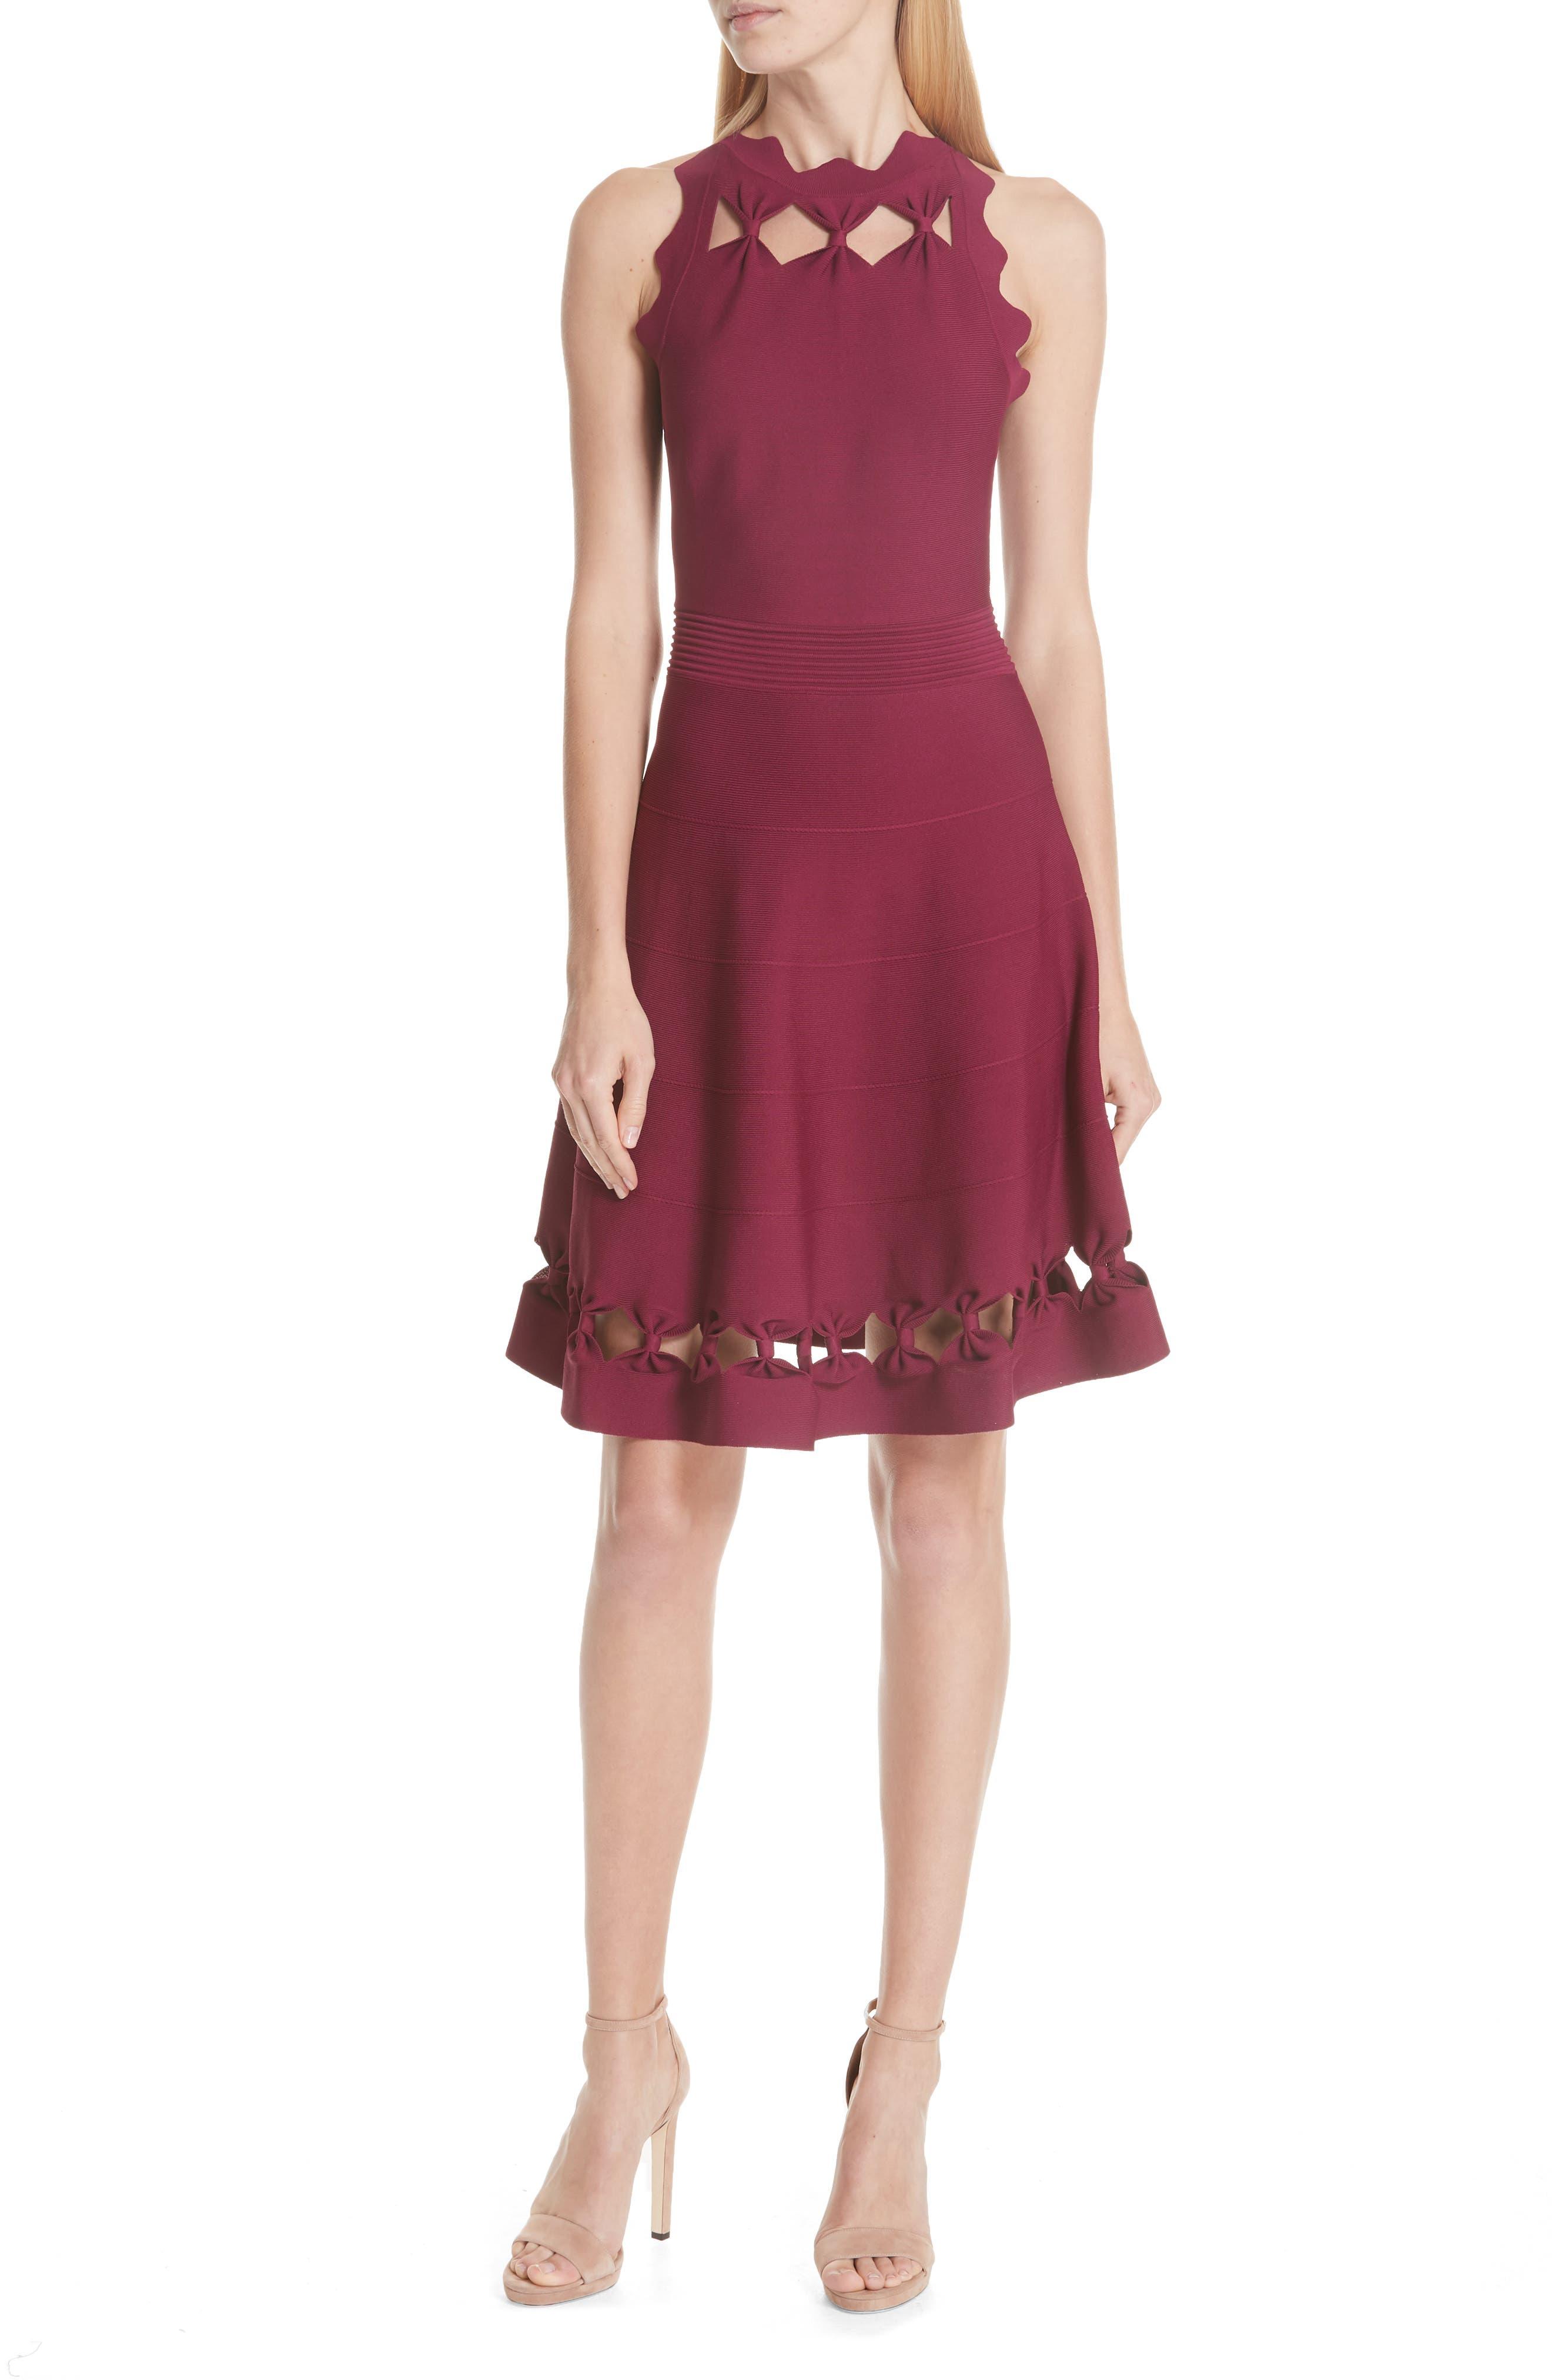 Cherina Bow Detail Fit & Flare Knit Dress,                             Main thumbnail 1, color,                             Maroon